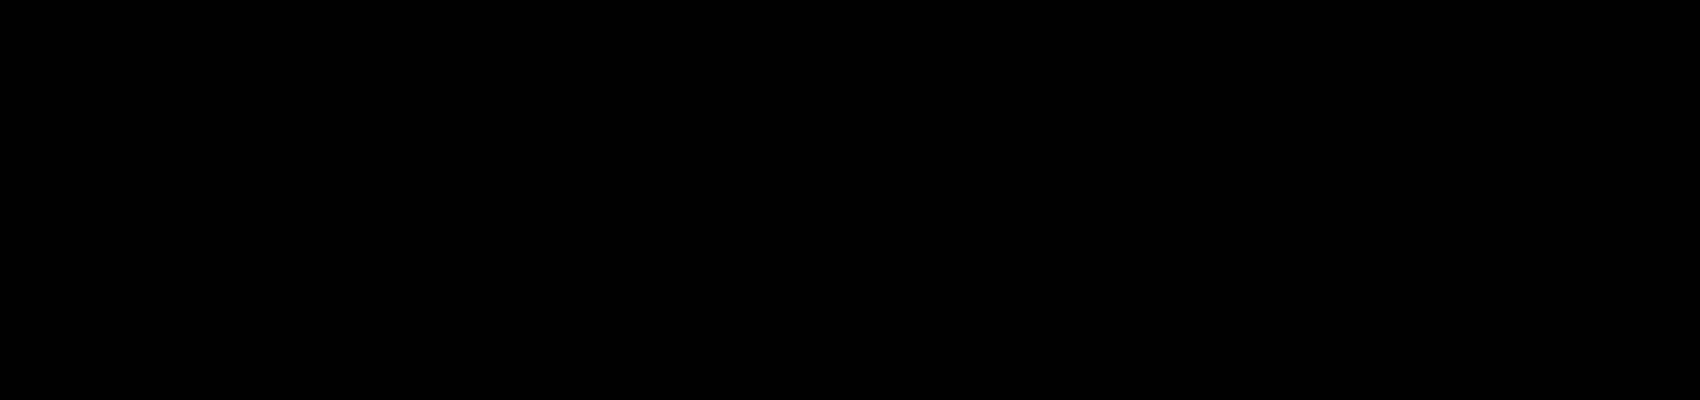 black-web-banner